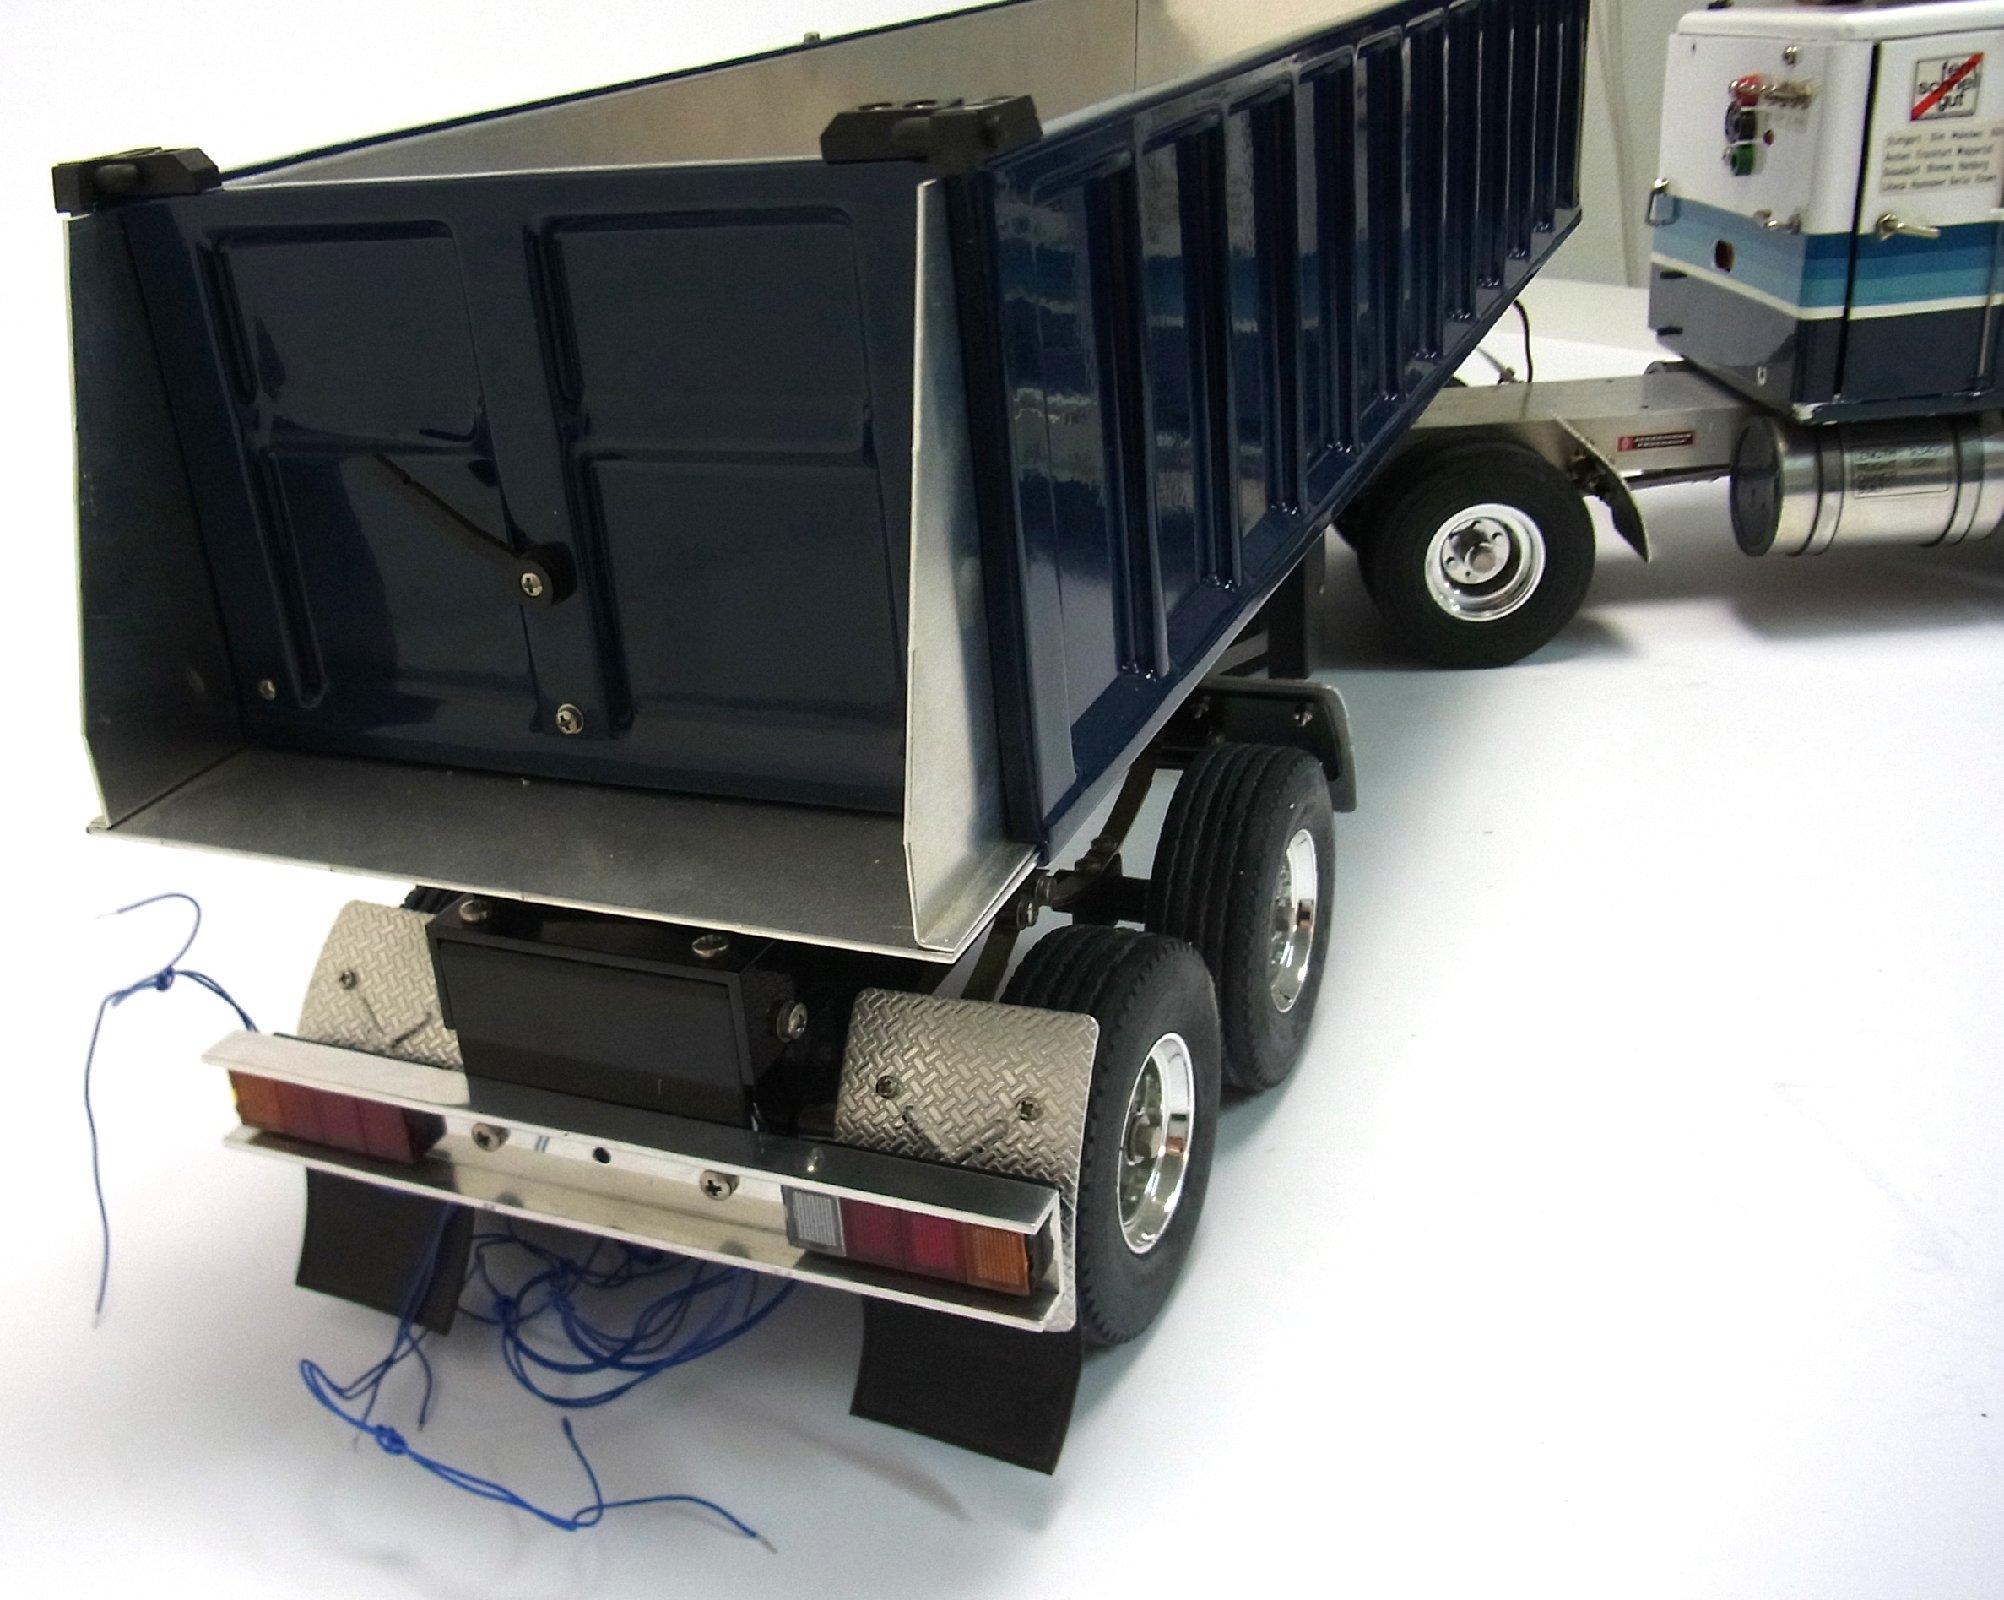 wedico rc conventinal truck lkw ferngesteuert graupner mx. Black Bedroom Furniture Sets. Home Design Ideas